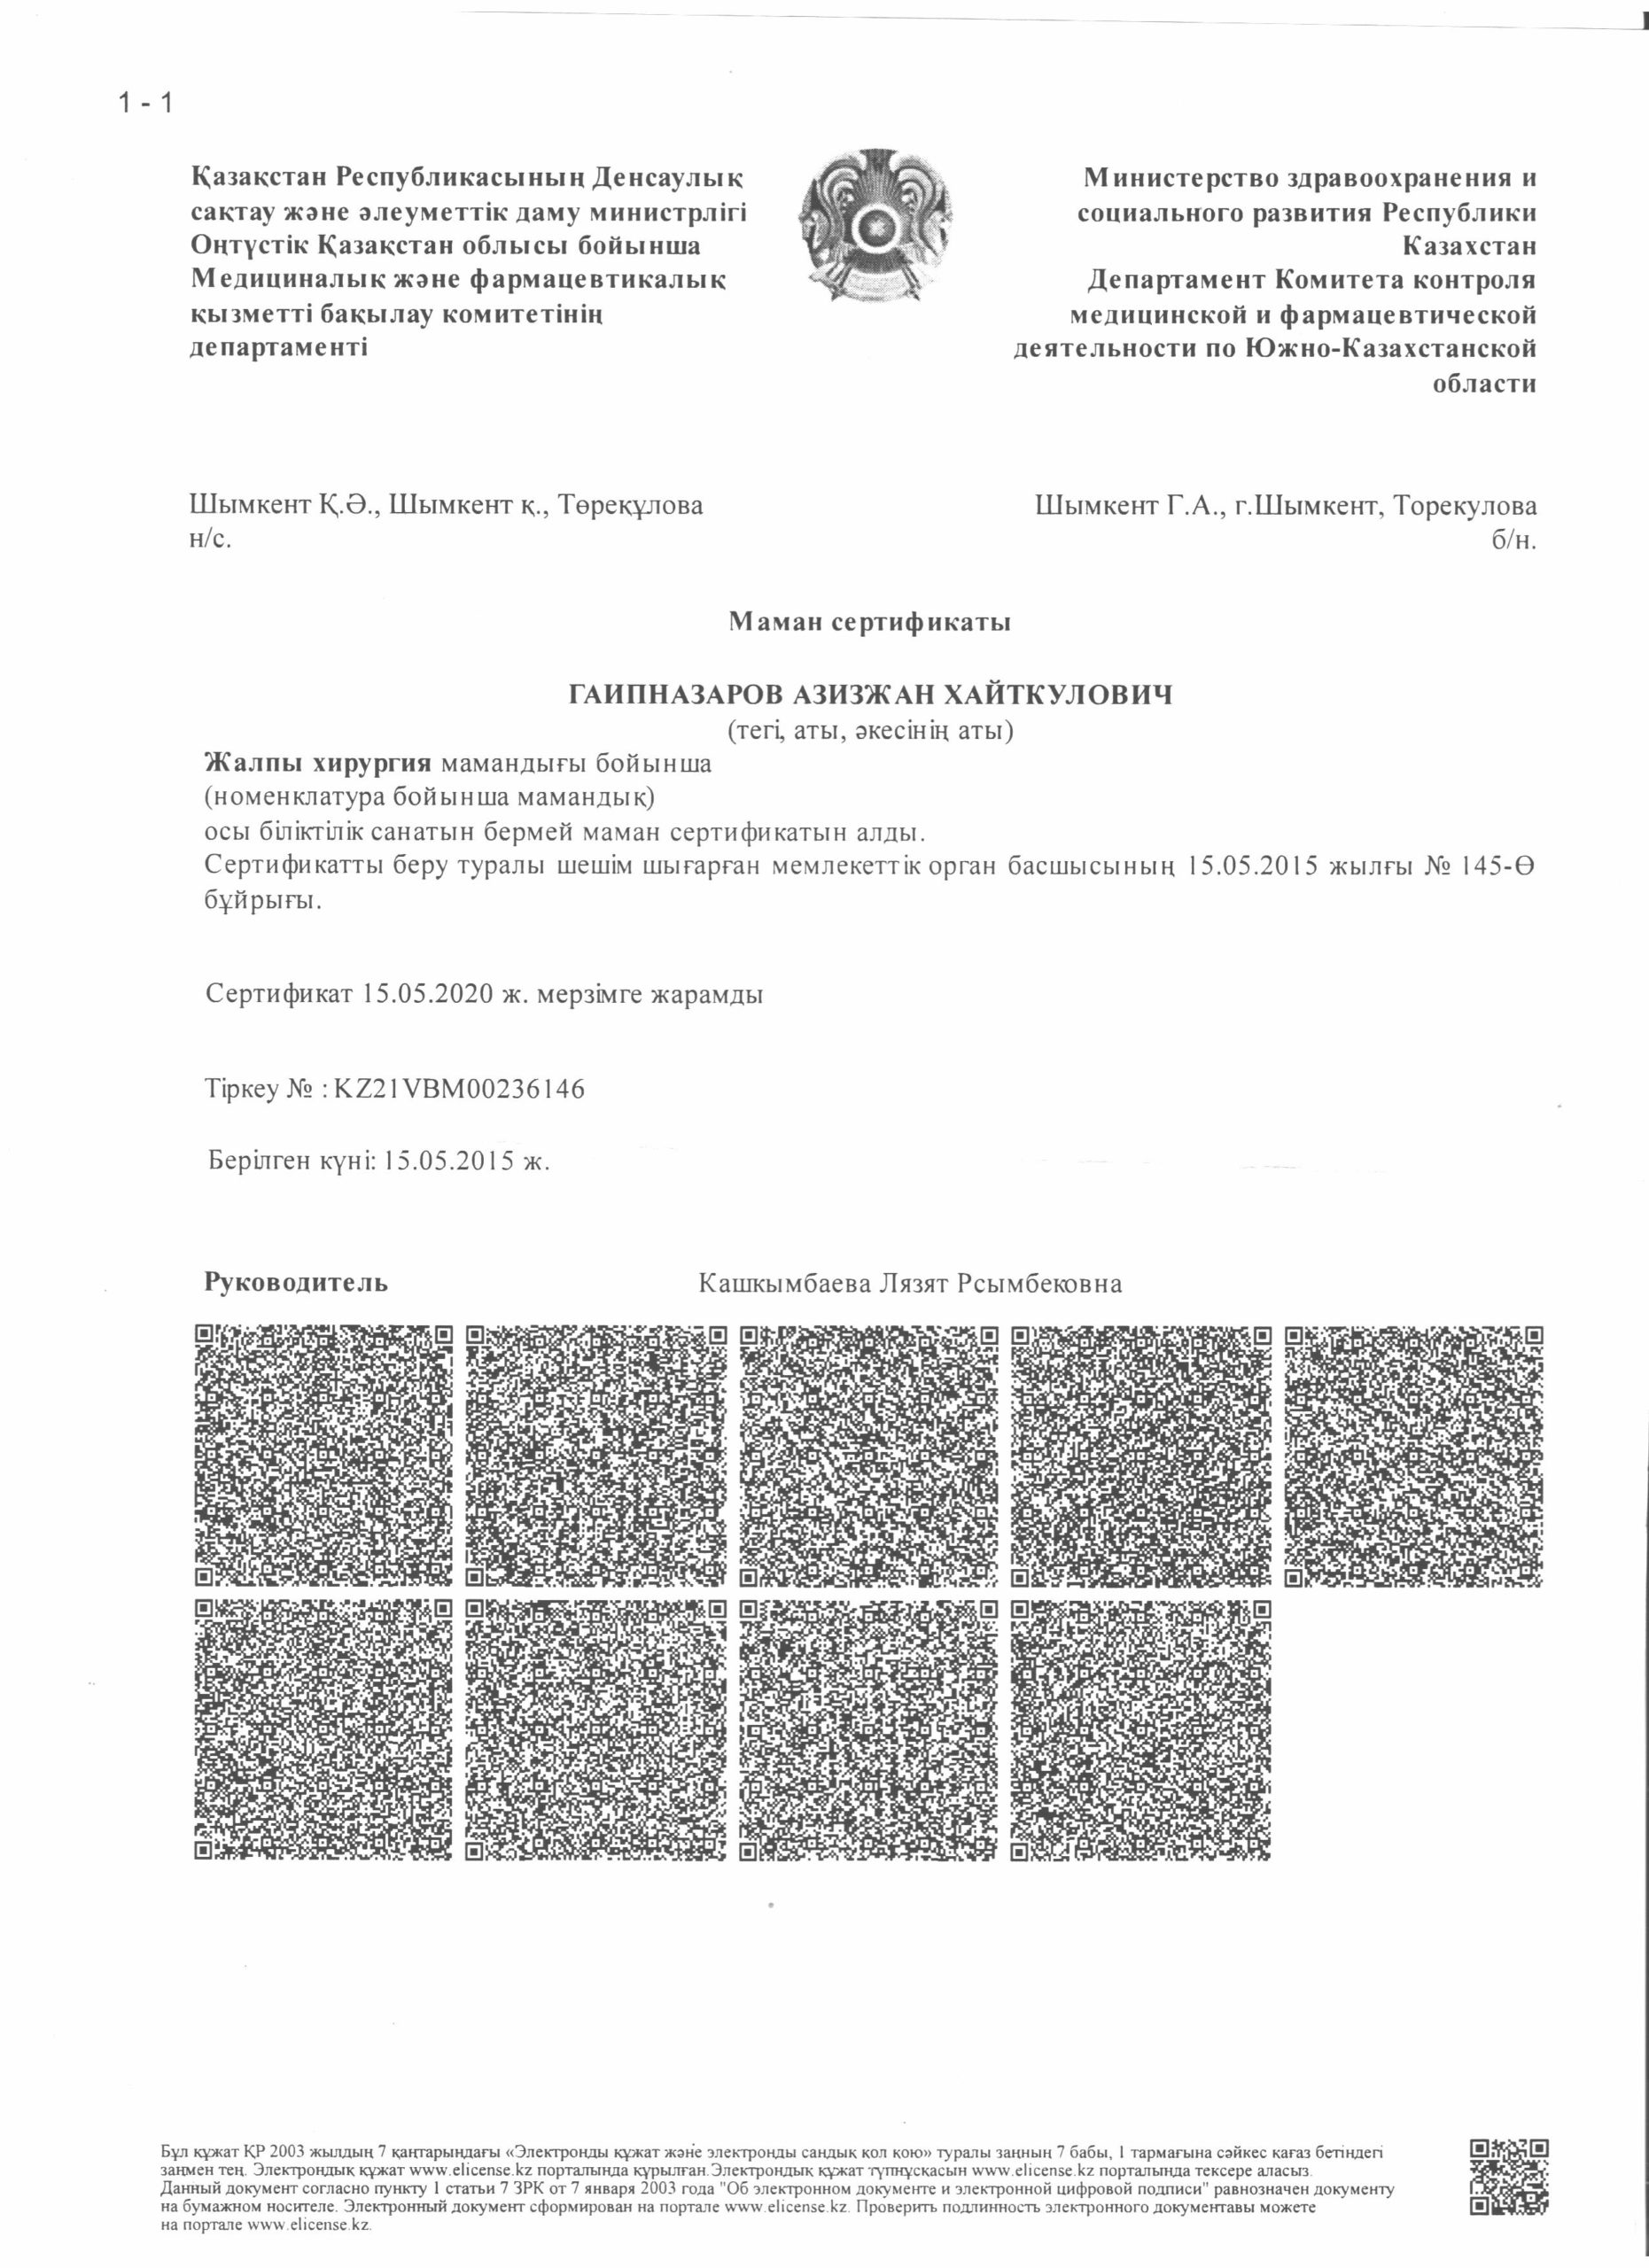 Сертификат эндоскопия клиники Akniet Shipa сайрамский р-н. с. Карабулак